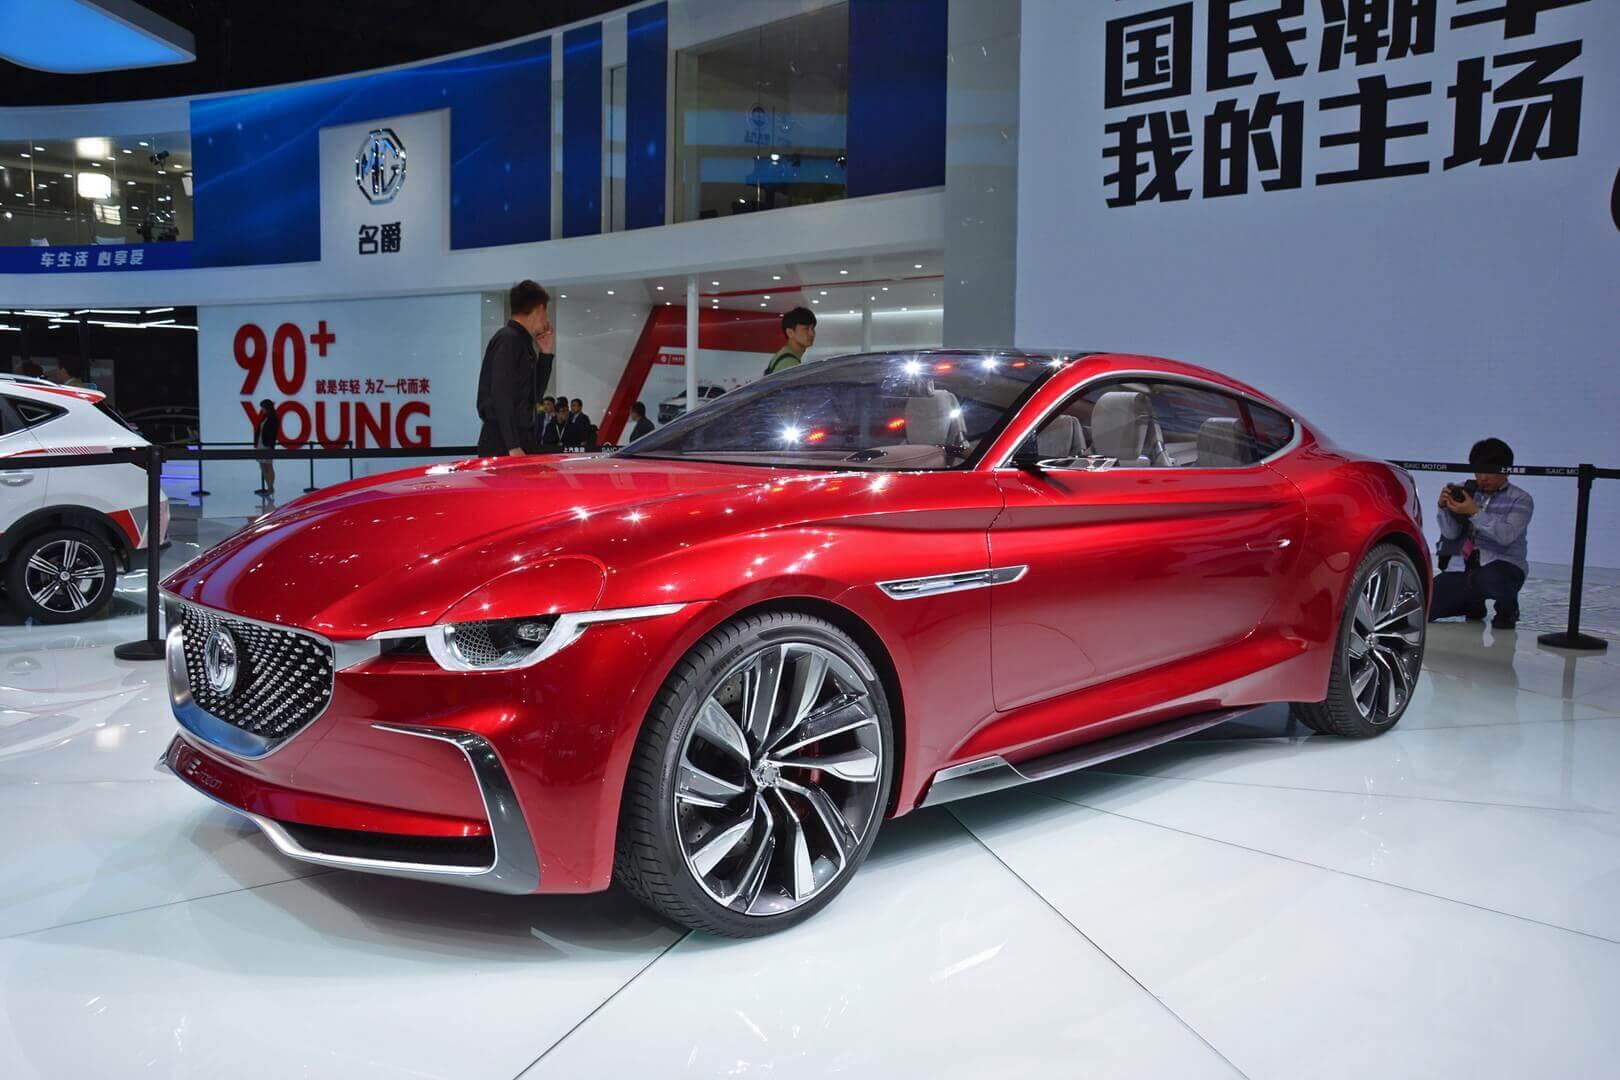 Электрический спорткар MG на базе концепта E-Motion запланирован на конец 2021 года